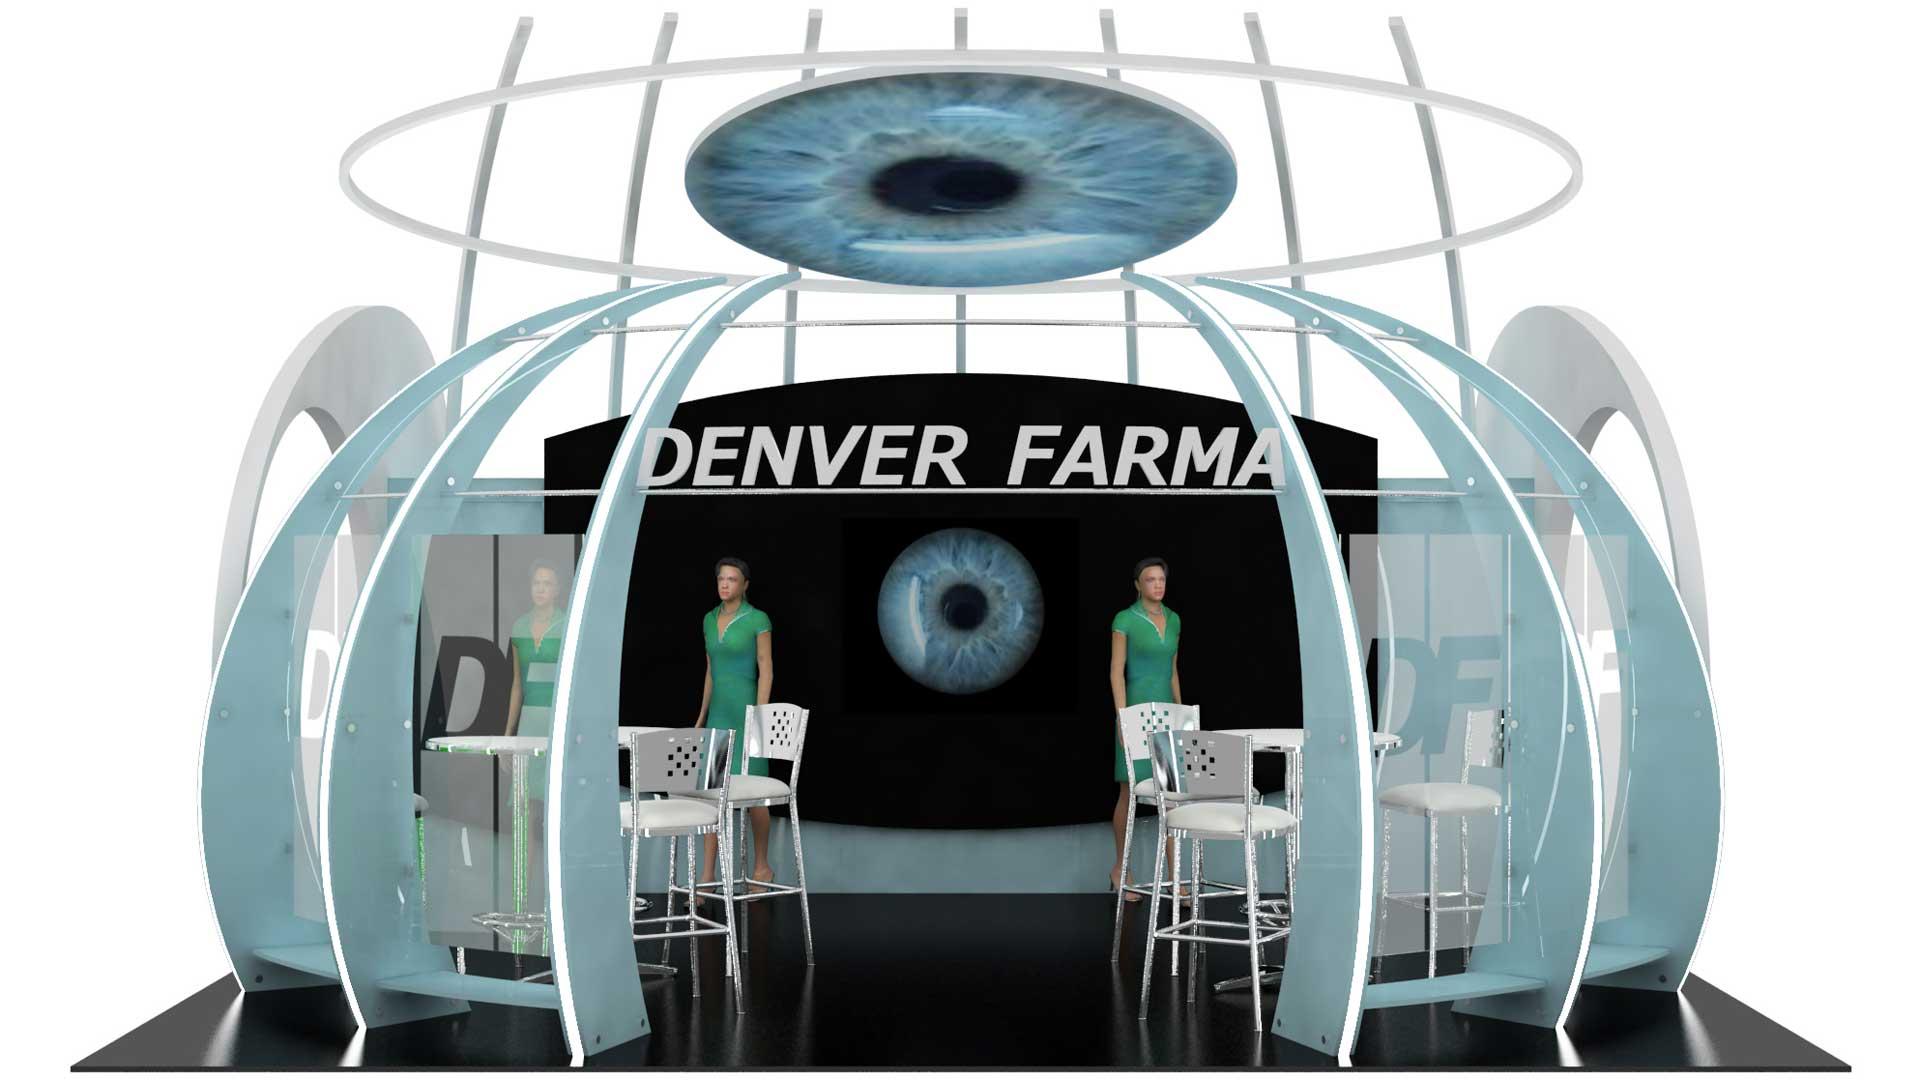 Renders 3D Arquitectura  Renders 109-Denver-Farma-expofarmacia-2013-camara-3